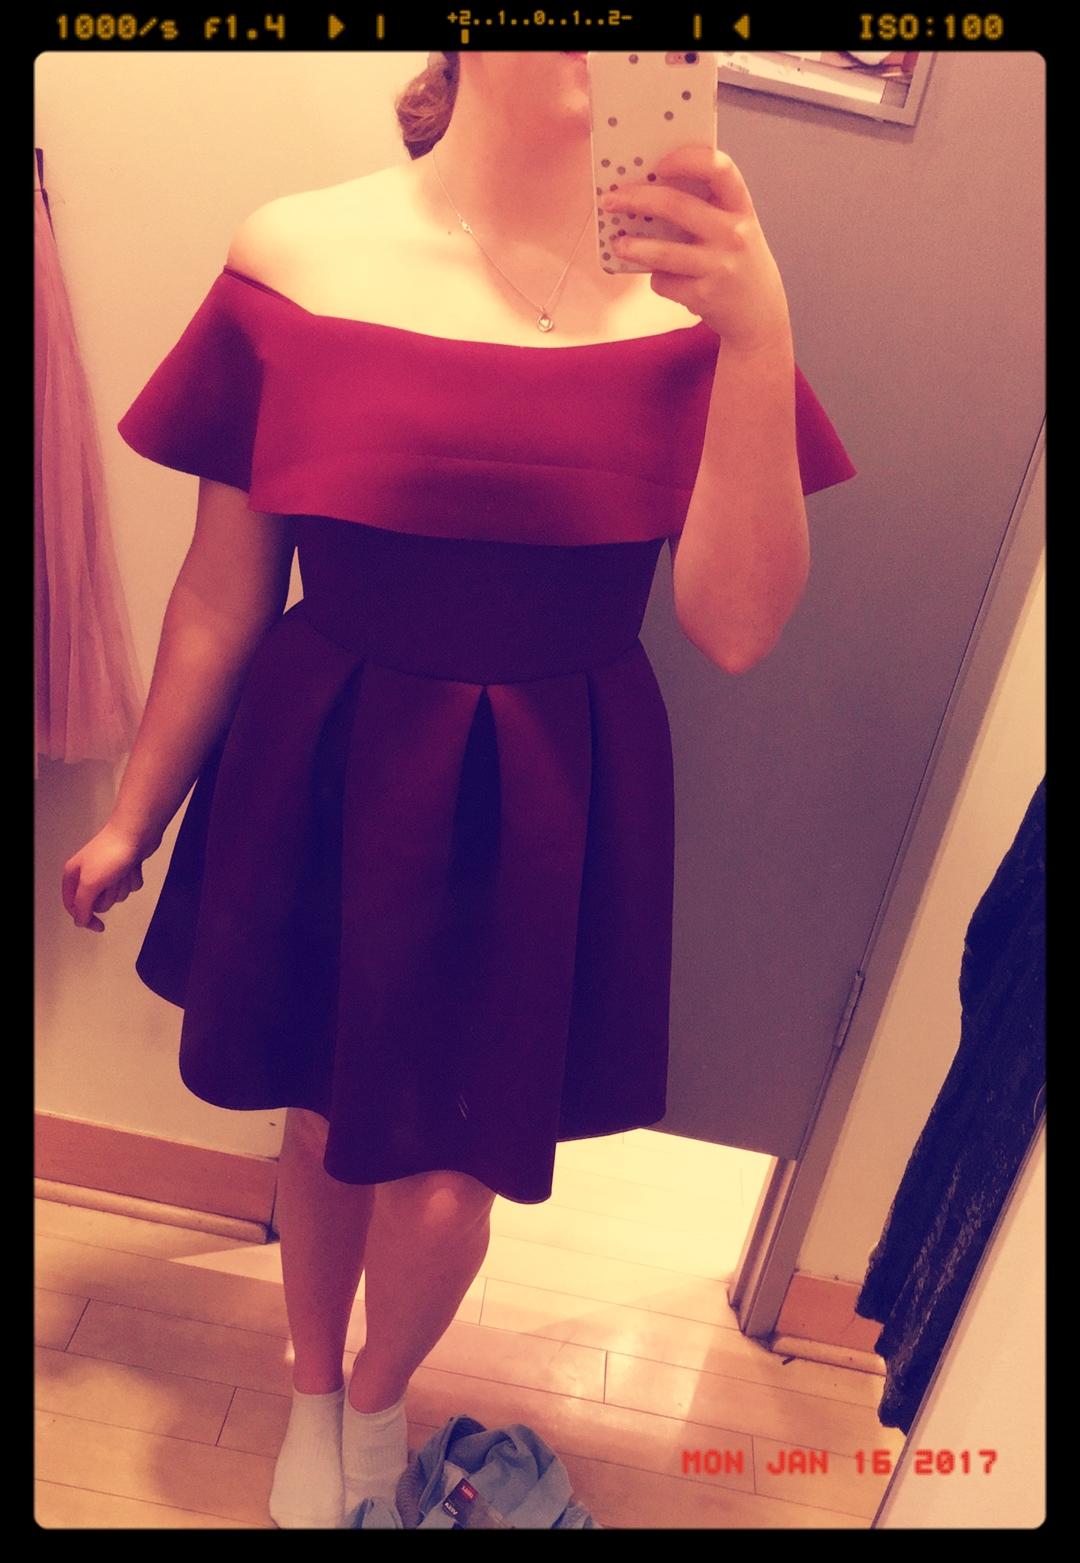 Homecoming dress found!